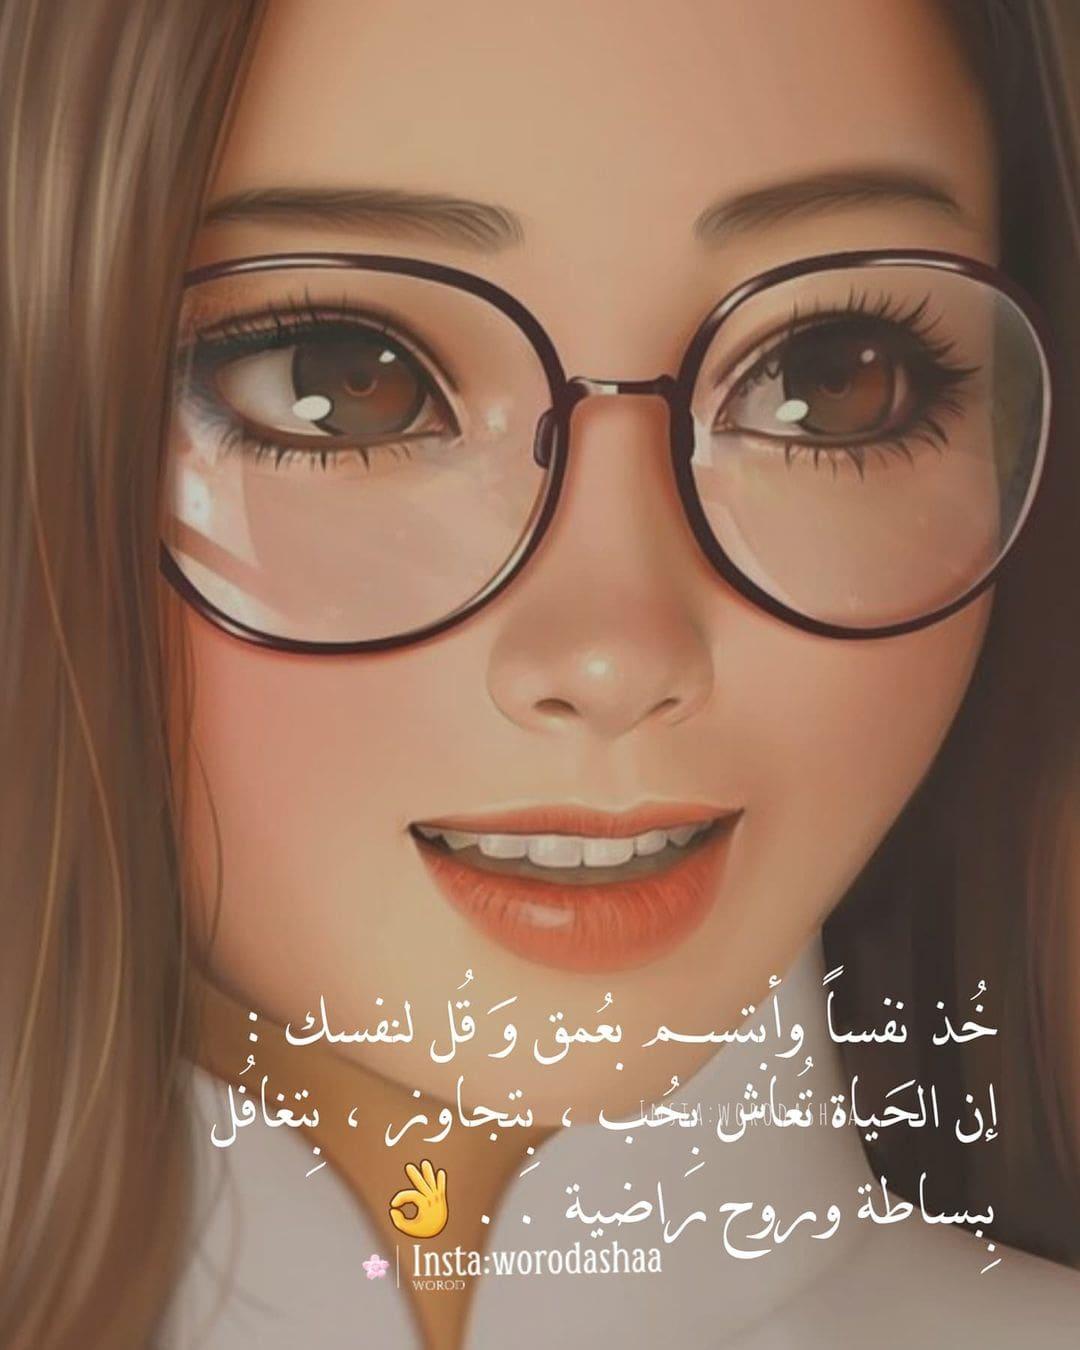 Arabic Caption with Beautiful Unique DP